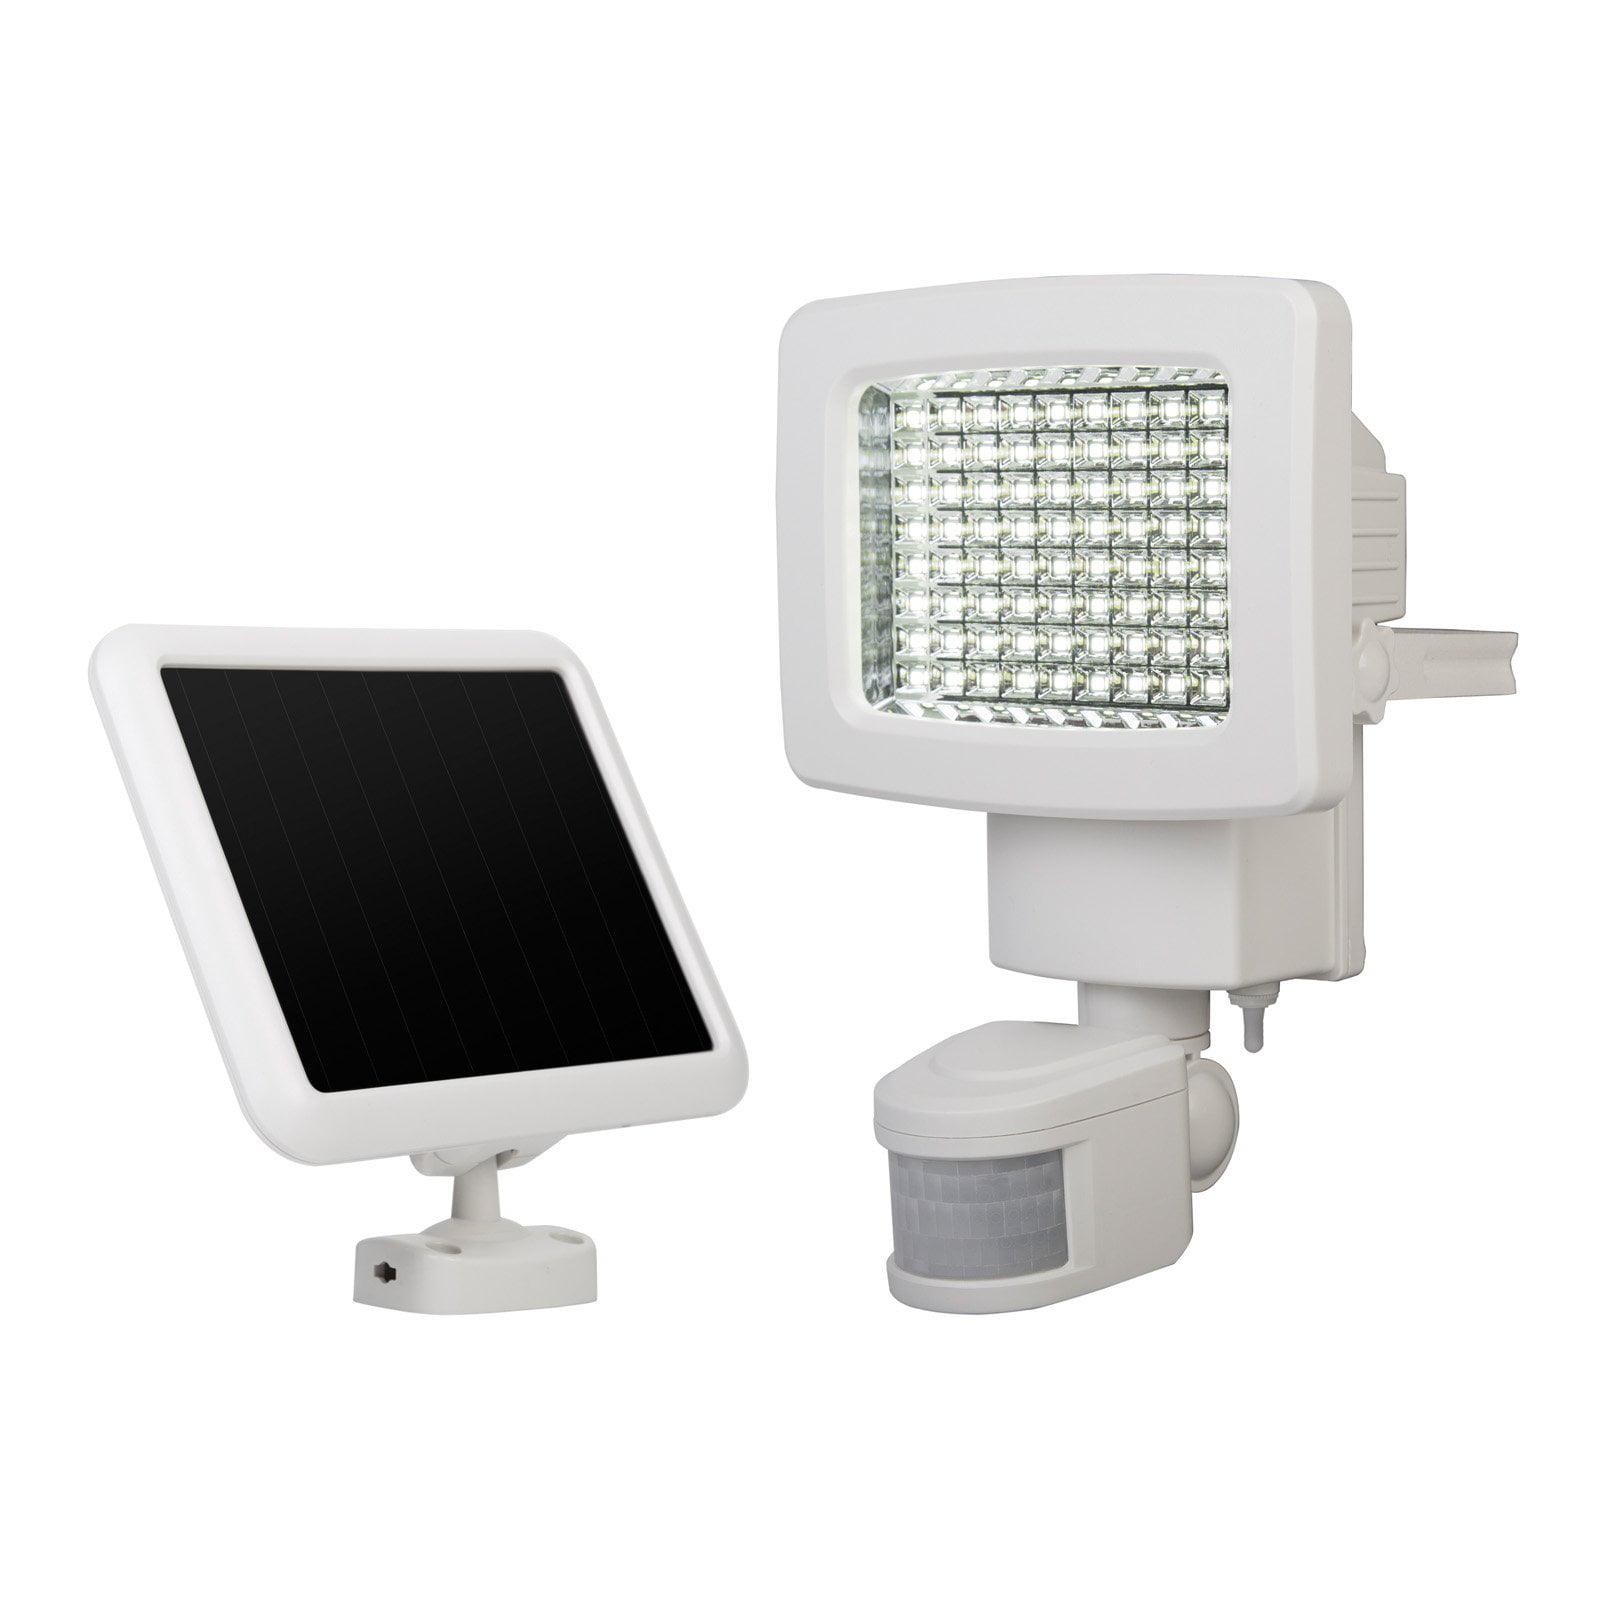 Sunforce 80 LED Solar Motion Security Light